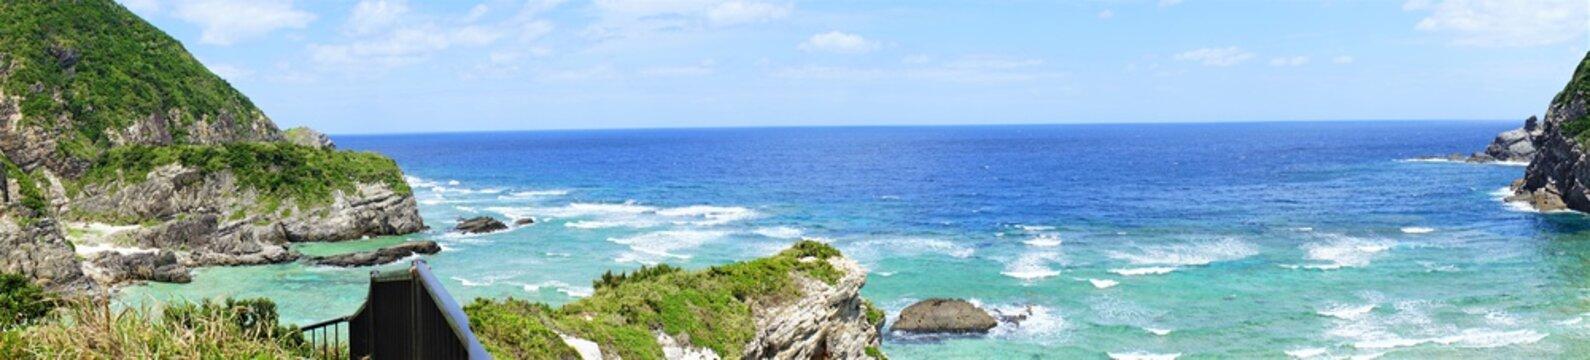 Chishi observation deck in Zamami island, Okinawa, Japan - 日本 沖縄 座間味島 チシ展望台 パノラマ